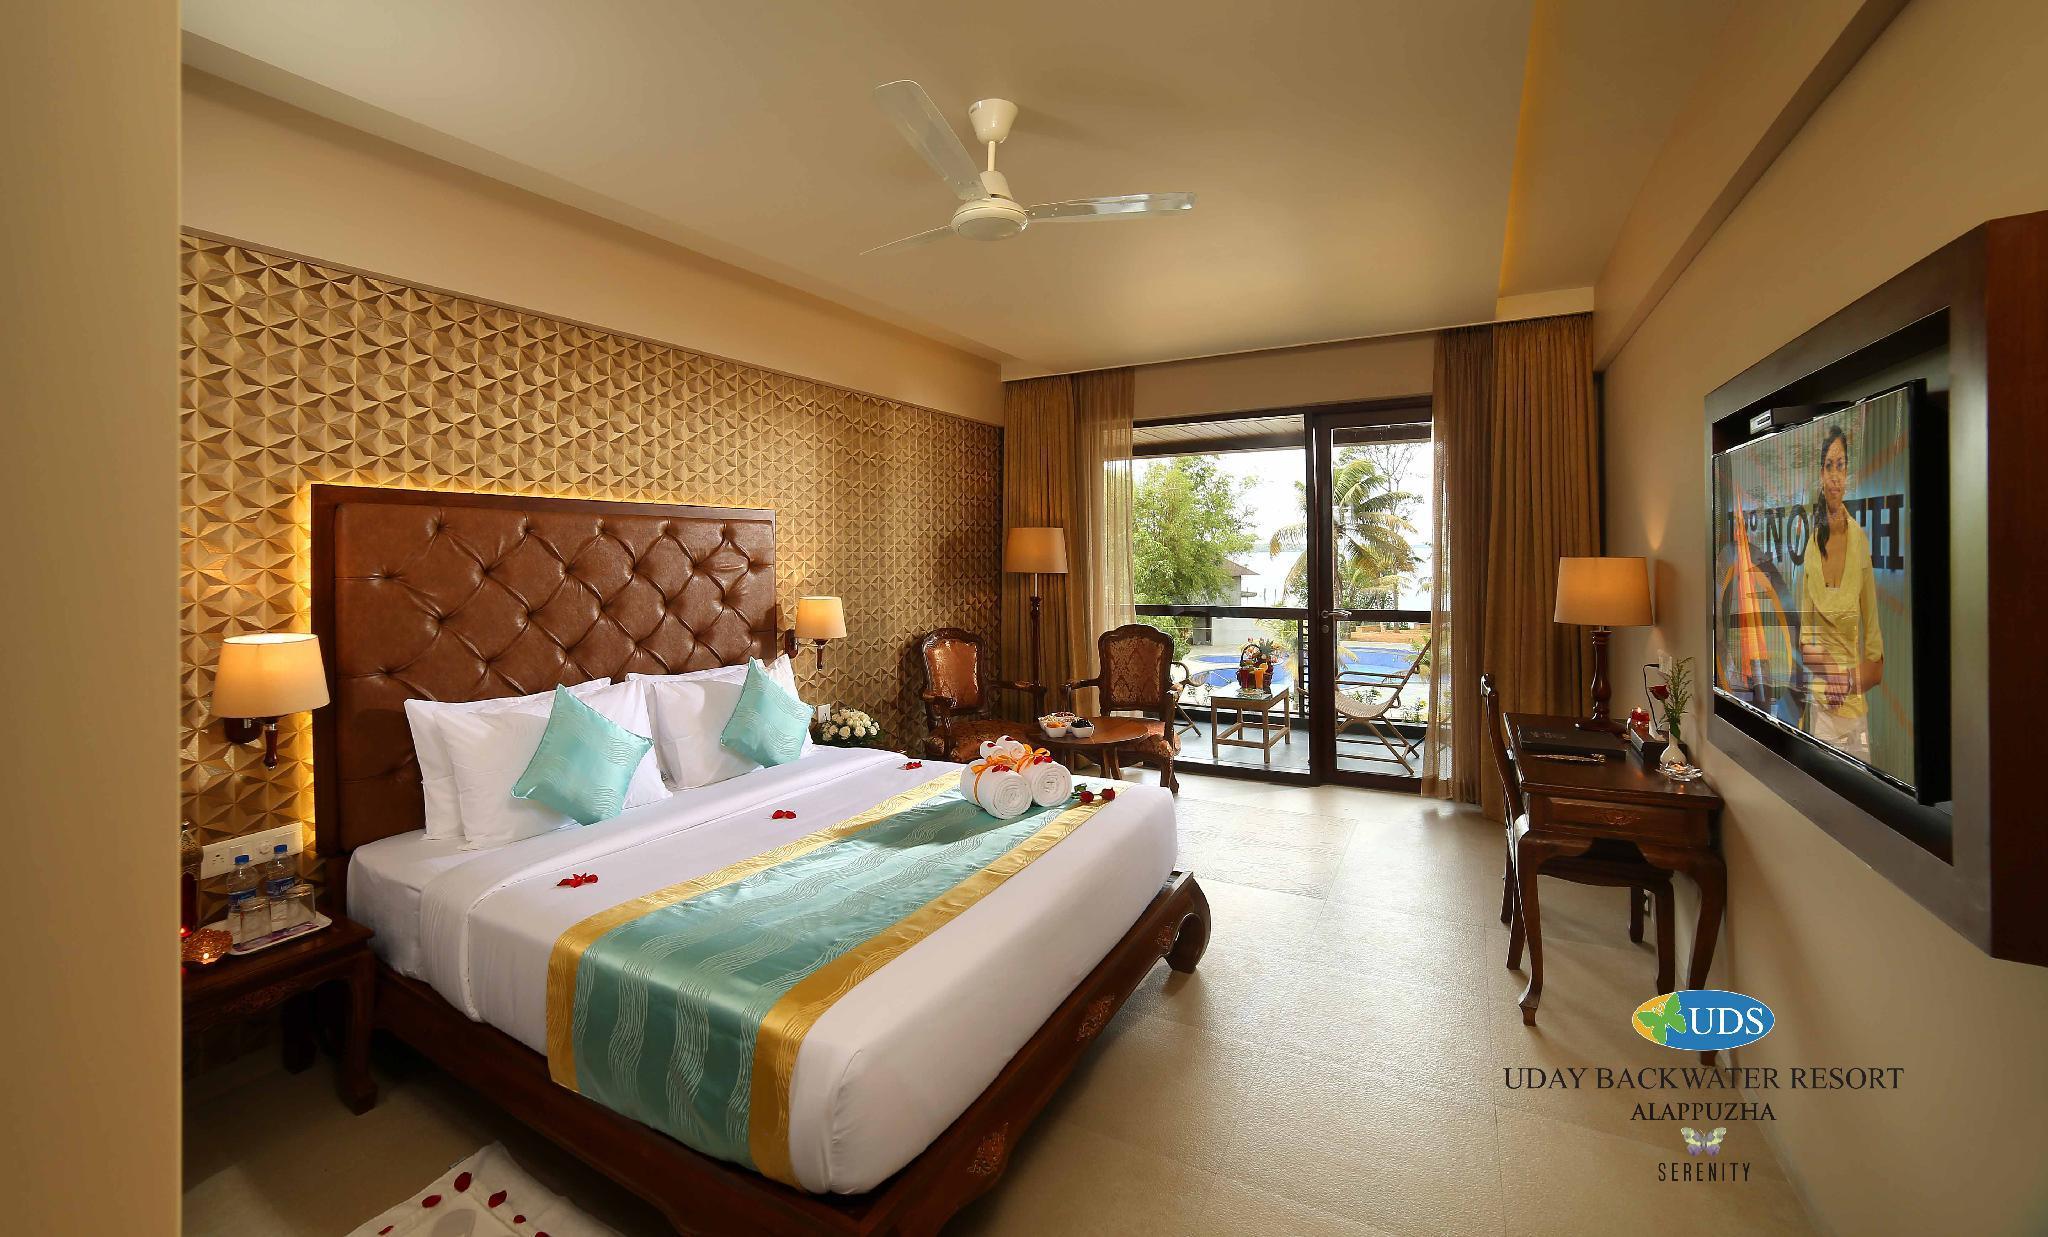 Uday Backwater Resort, Alappuzha